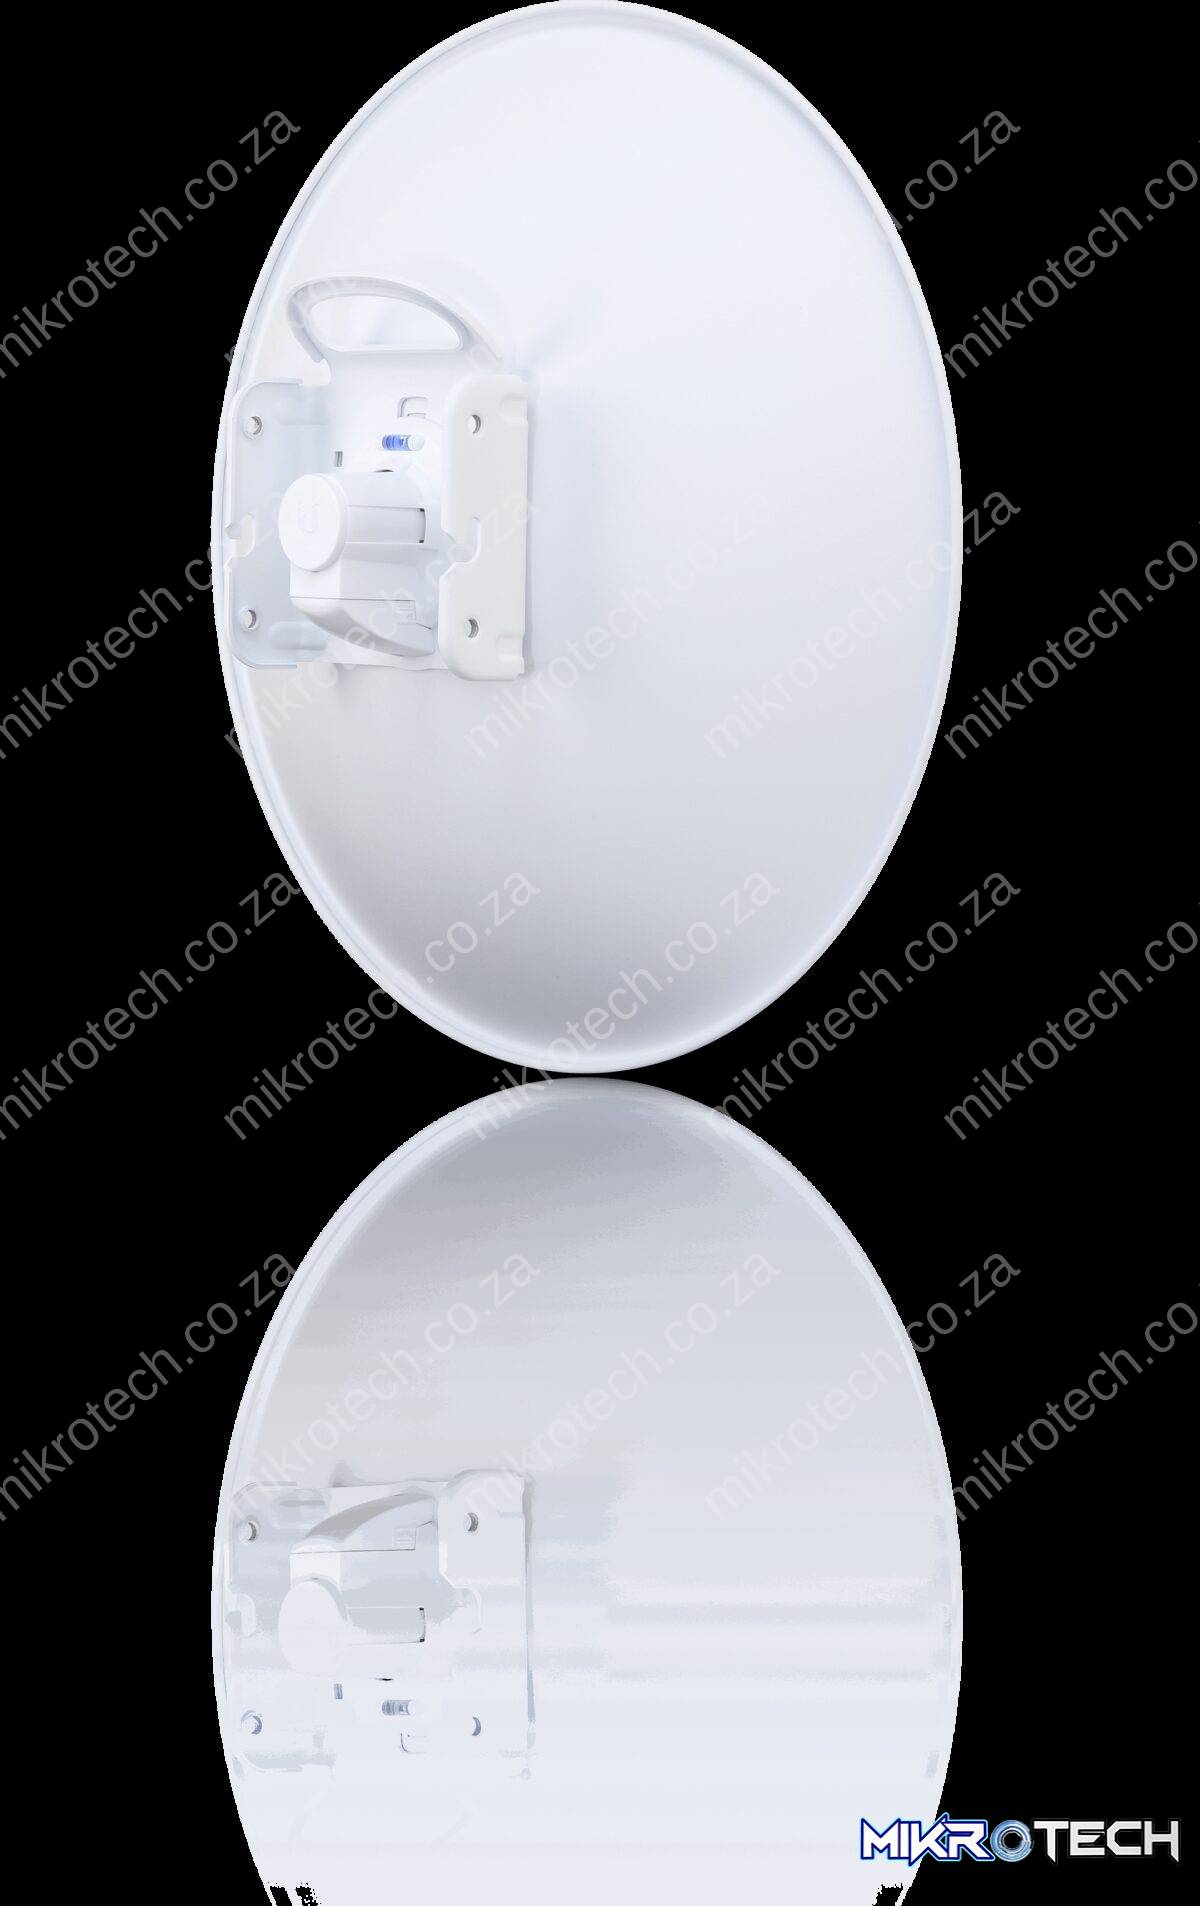 Ubiquiti airMAX - PowerBeam 5AC Gen2